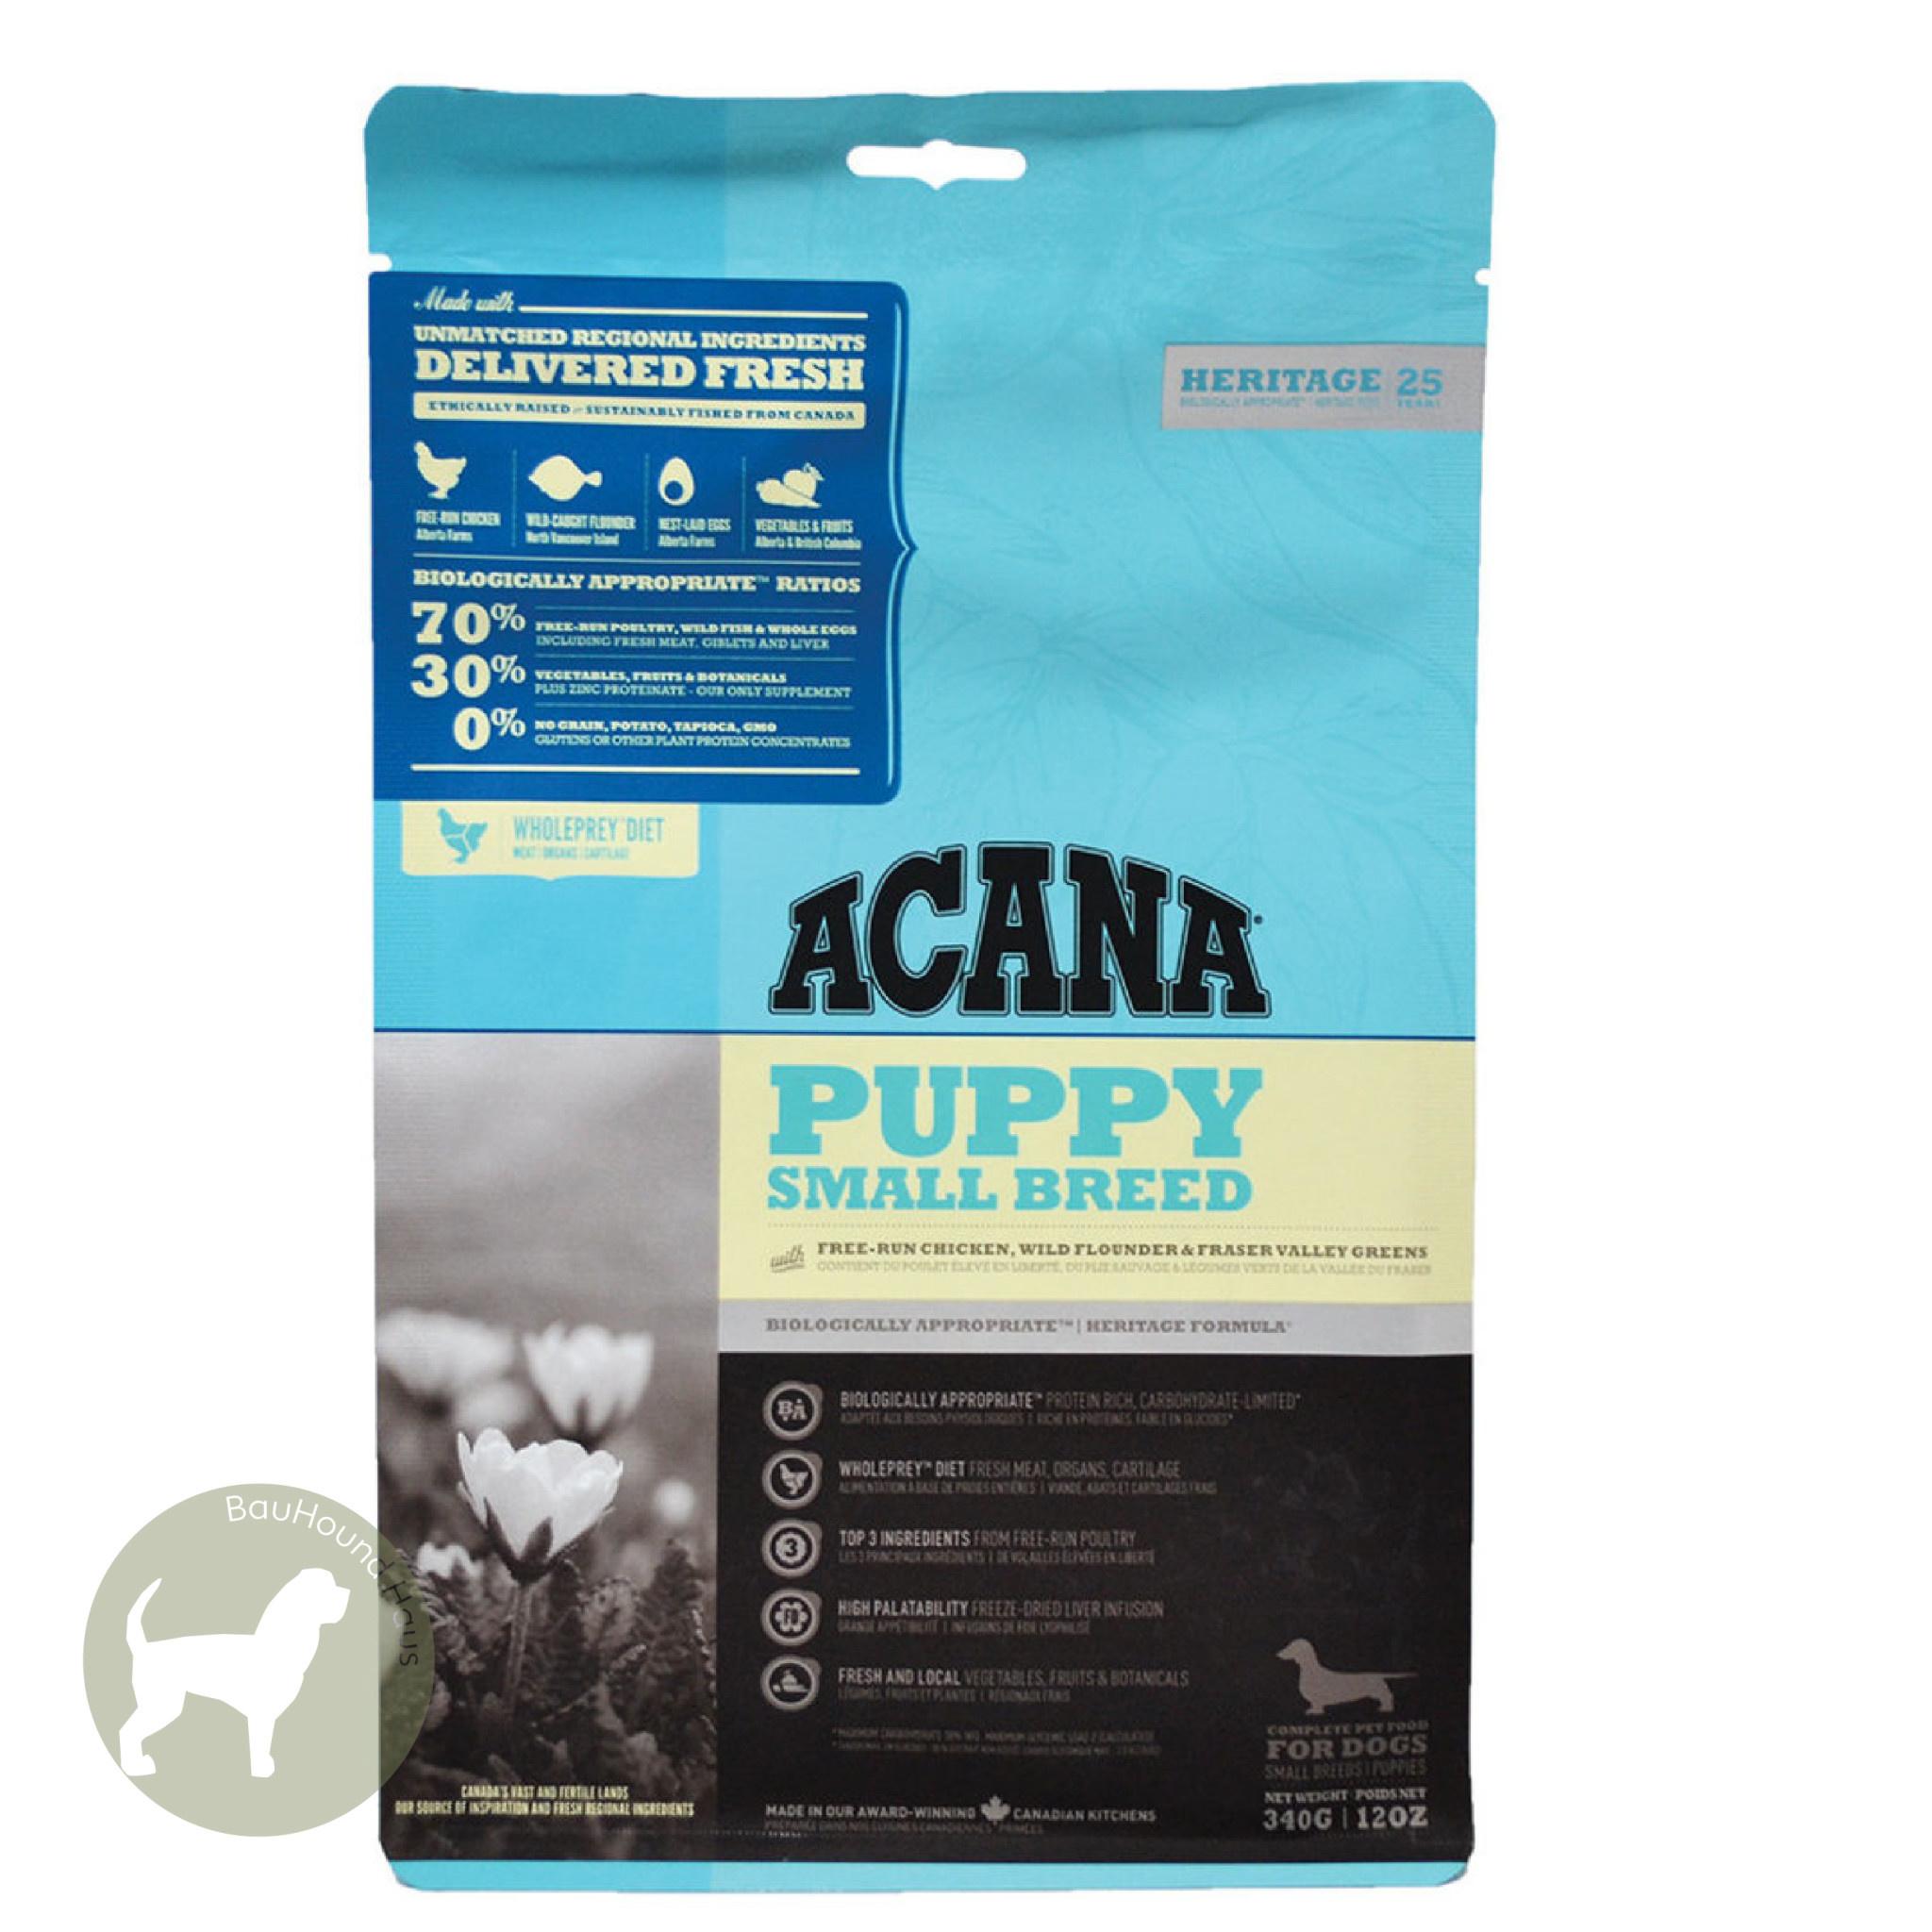 Acana Acana HERITAGE Puppy Small Breed Kibble, 1.8kg